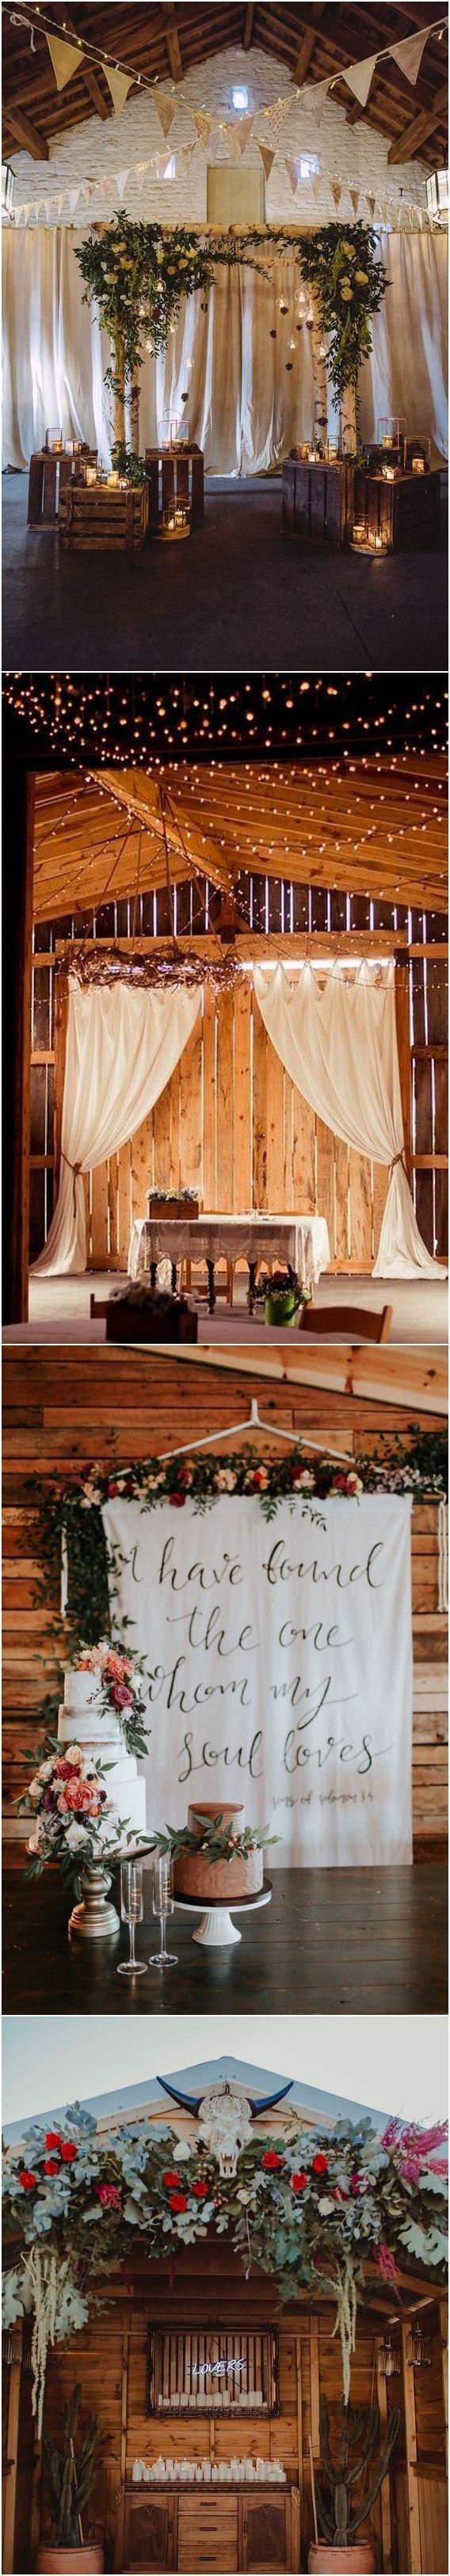 25+ unique Backdrop ideas ideas on Pinterest | Wedding ...